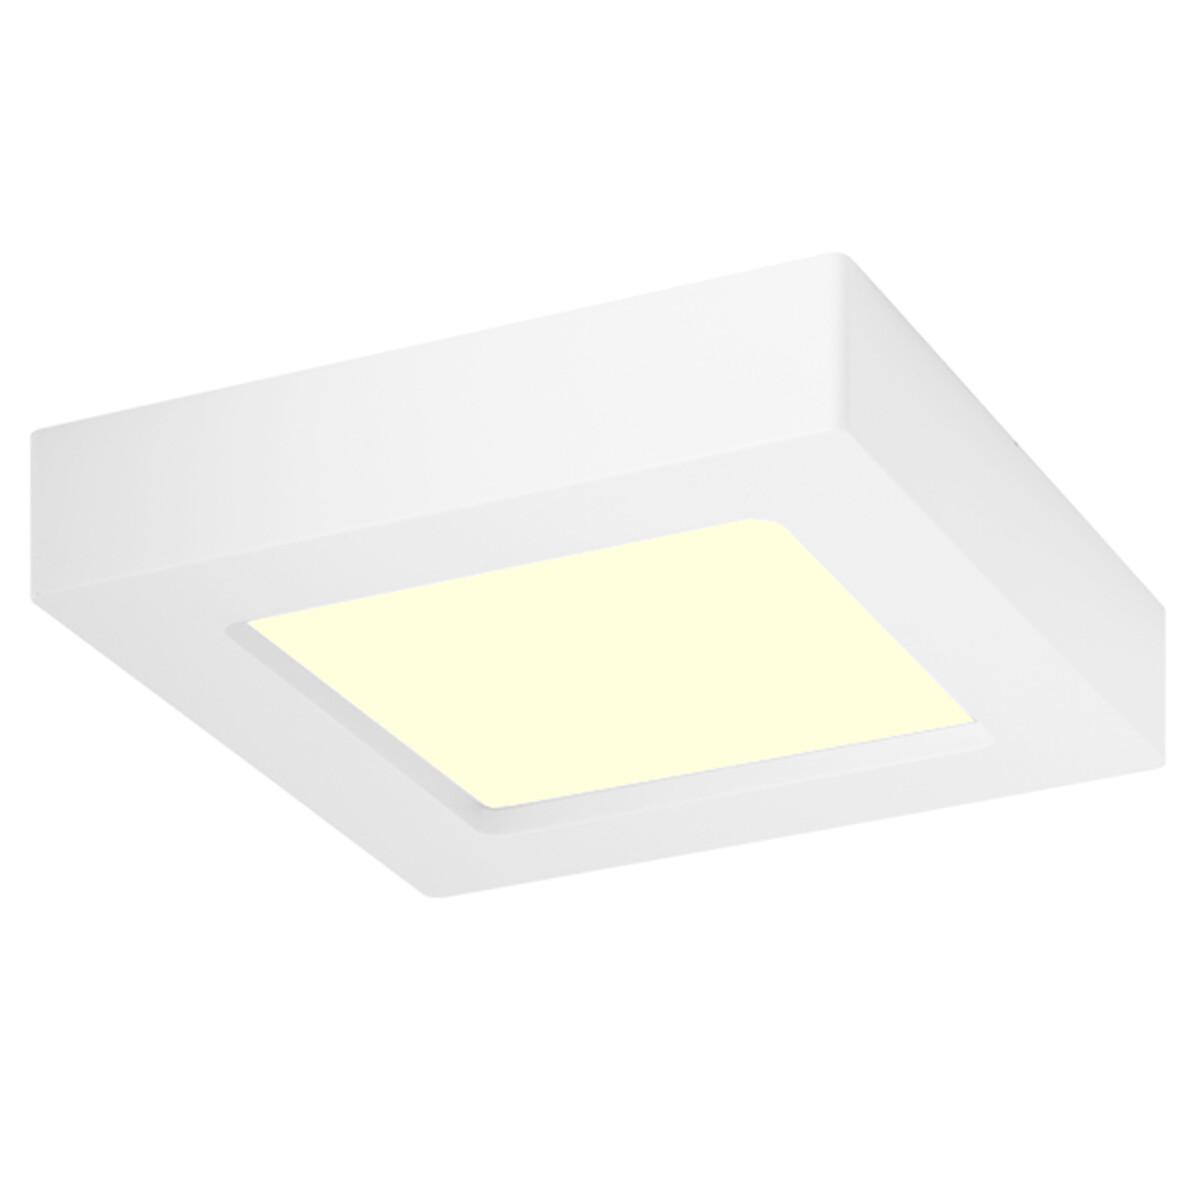 LED Downlight Slim Pro - Aigi Strilo - Opbouw Vierkant 6W - Warm Wit 3000K - Mat Wit - Kunststof